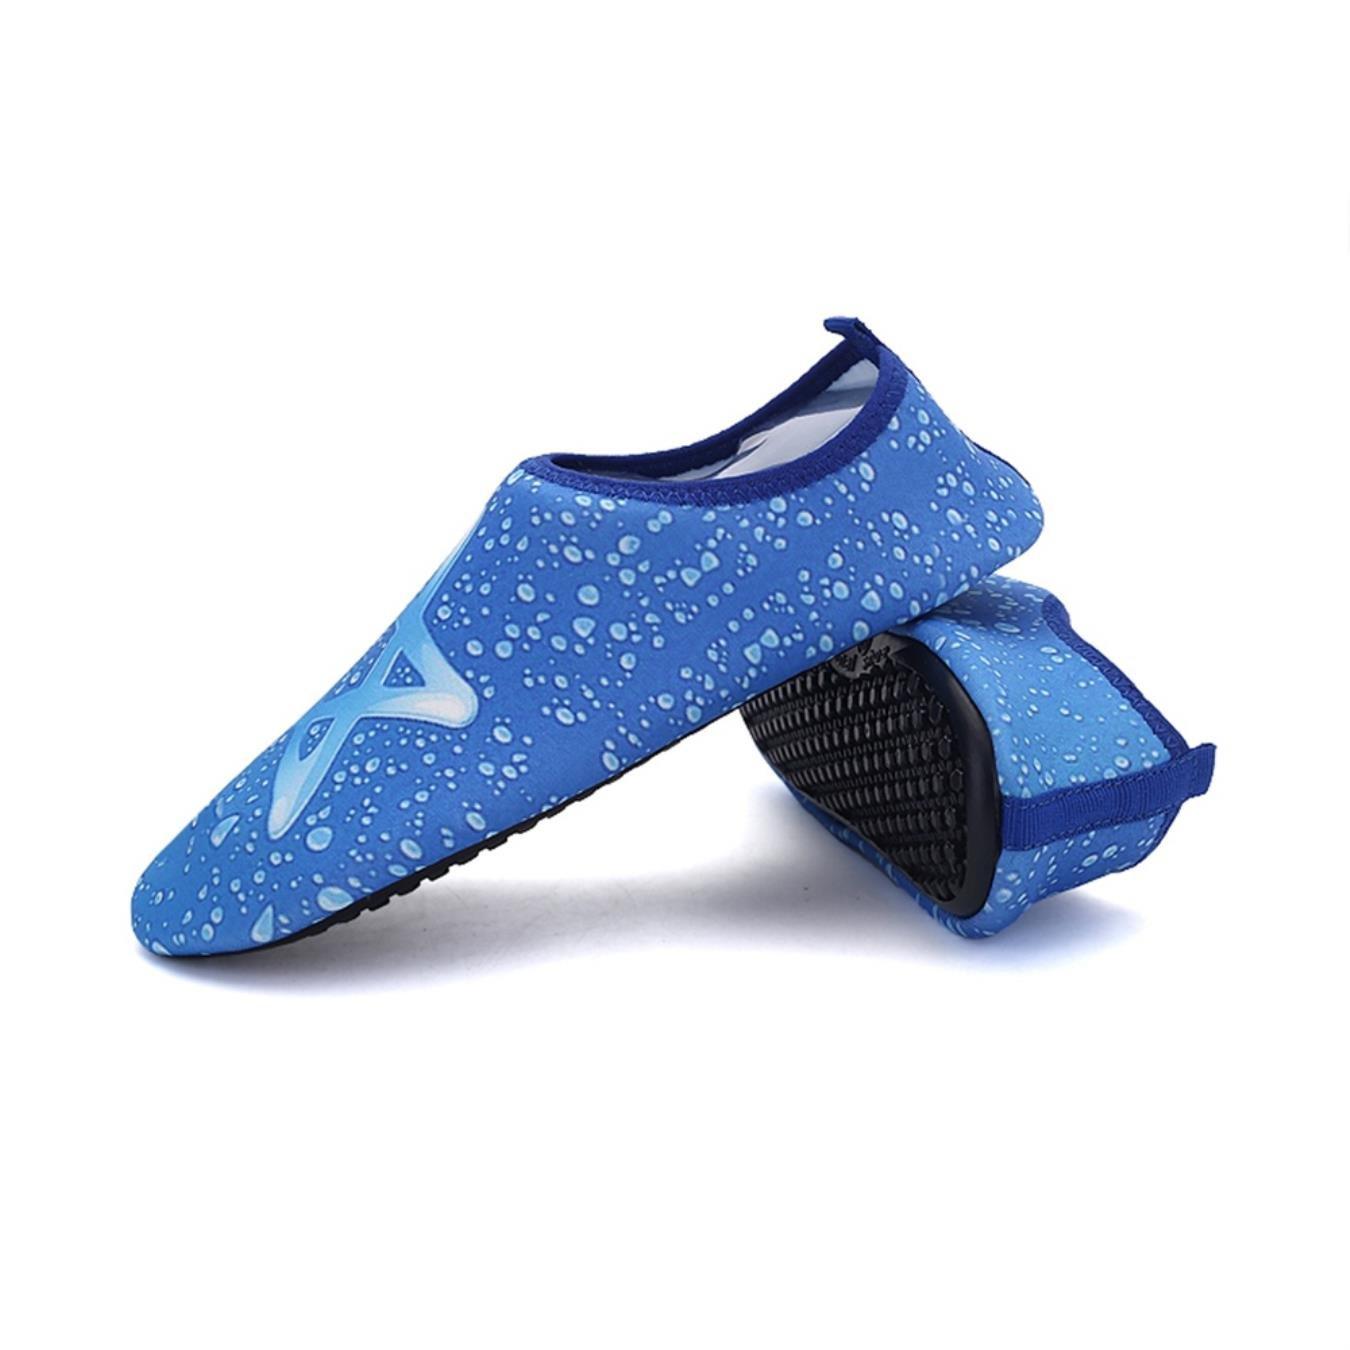 GoneForever APPAREL ユニセックスアダルト GoneForever B07D521RN9 US サイズ: 6.5 カラー: ブルー APPAREL B07D521RN9, 蒲屋忠兵衛商店:ce20a87c --- krianta.ru